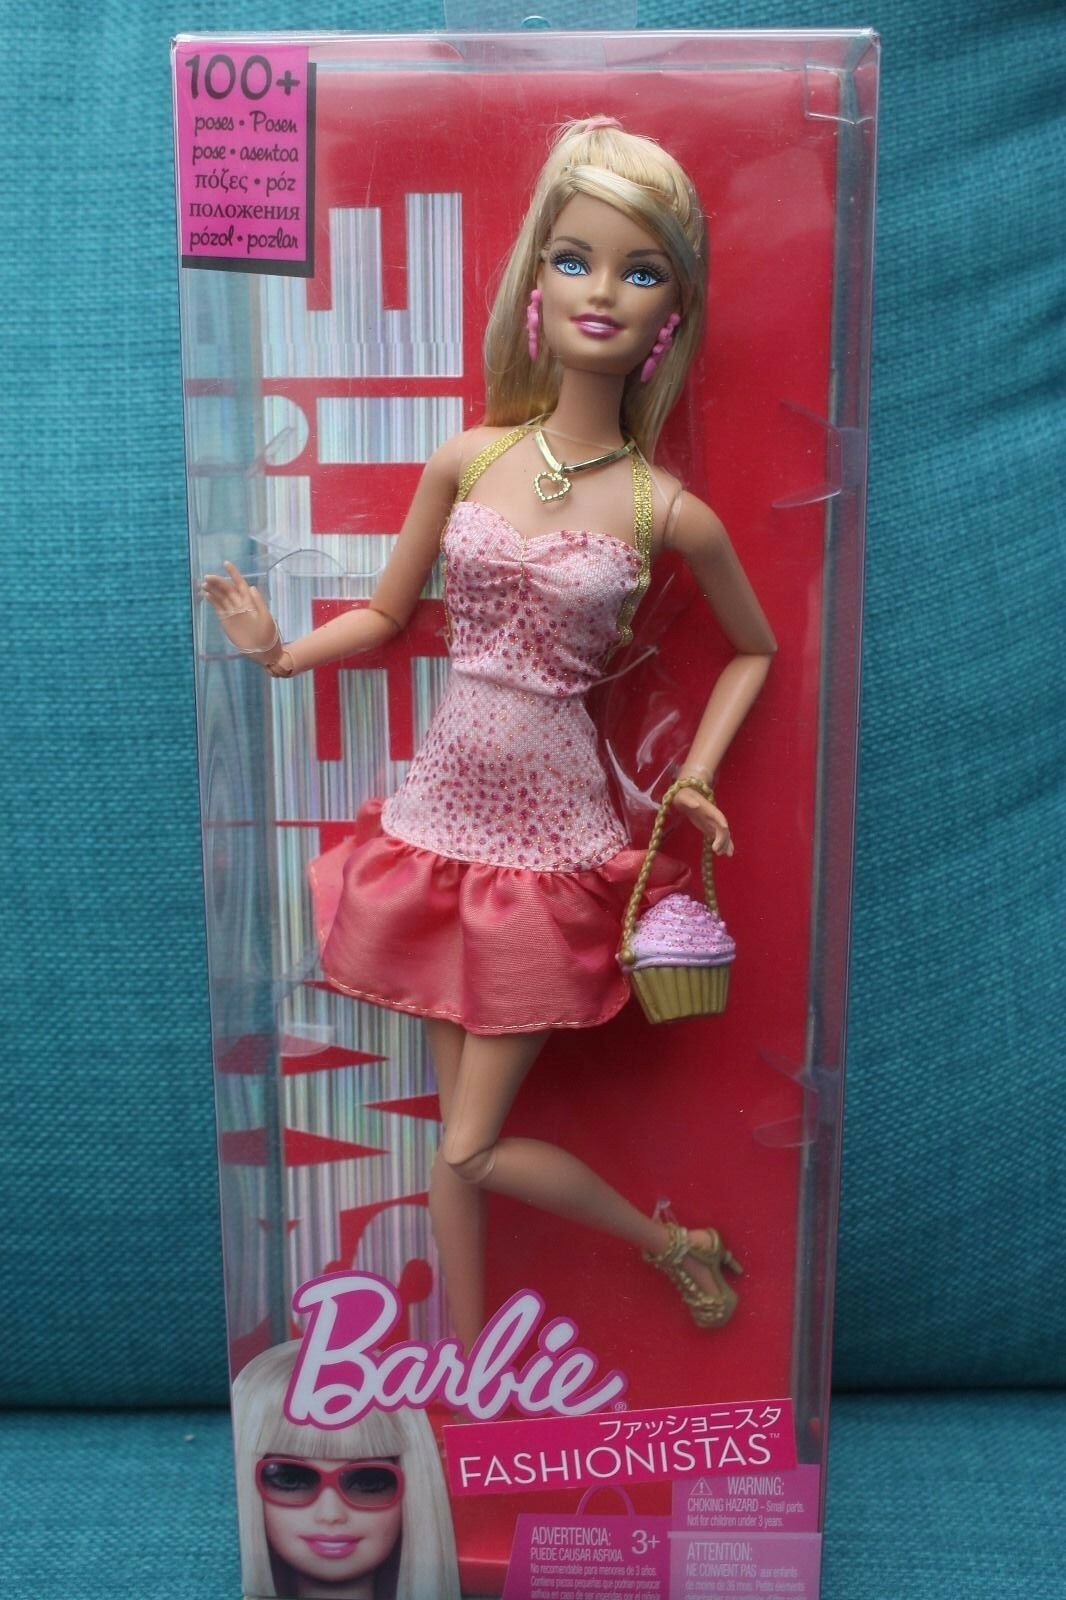 Mattel Barbie Fashionistas Sweetie doll 2009 articulated BNIB 1st wave wave wave release 8c35d4